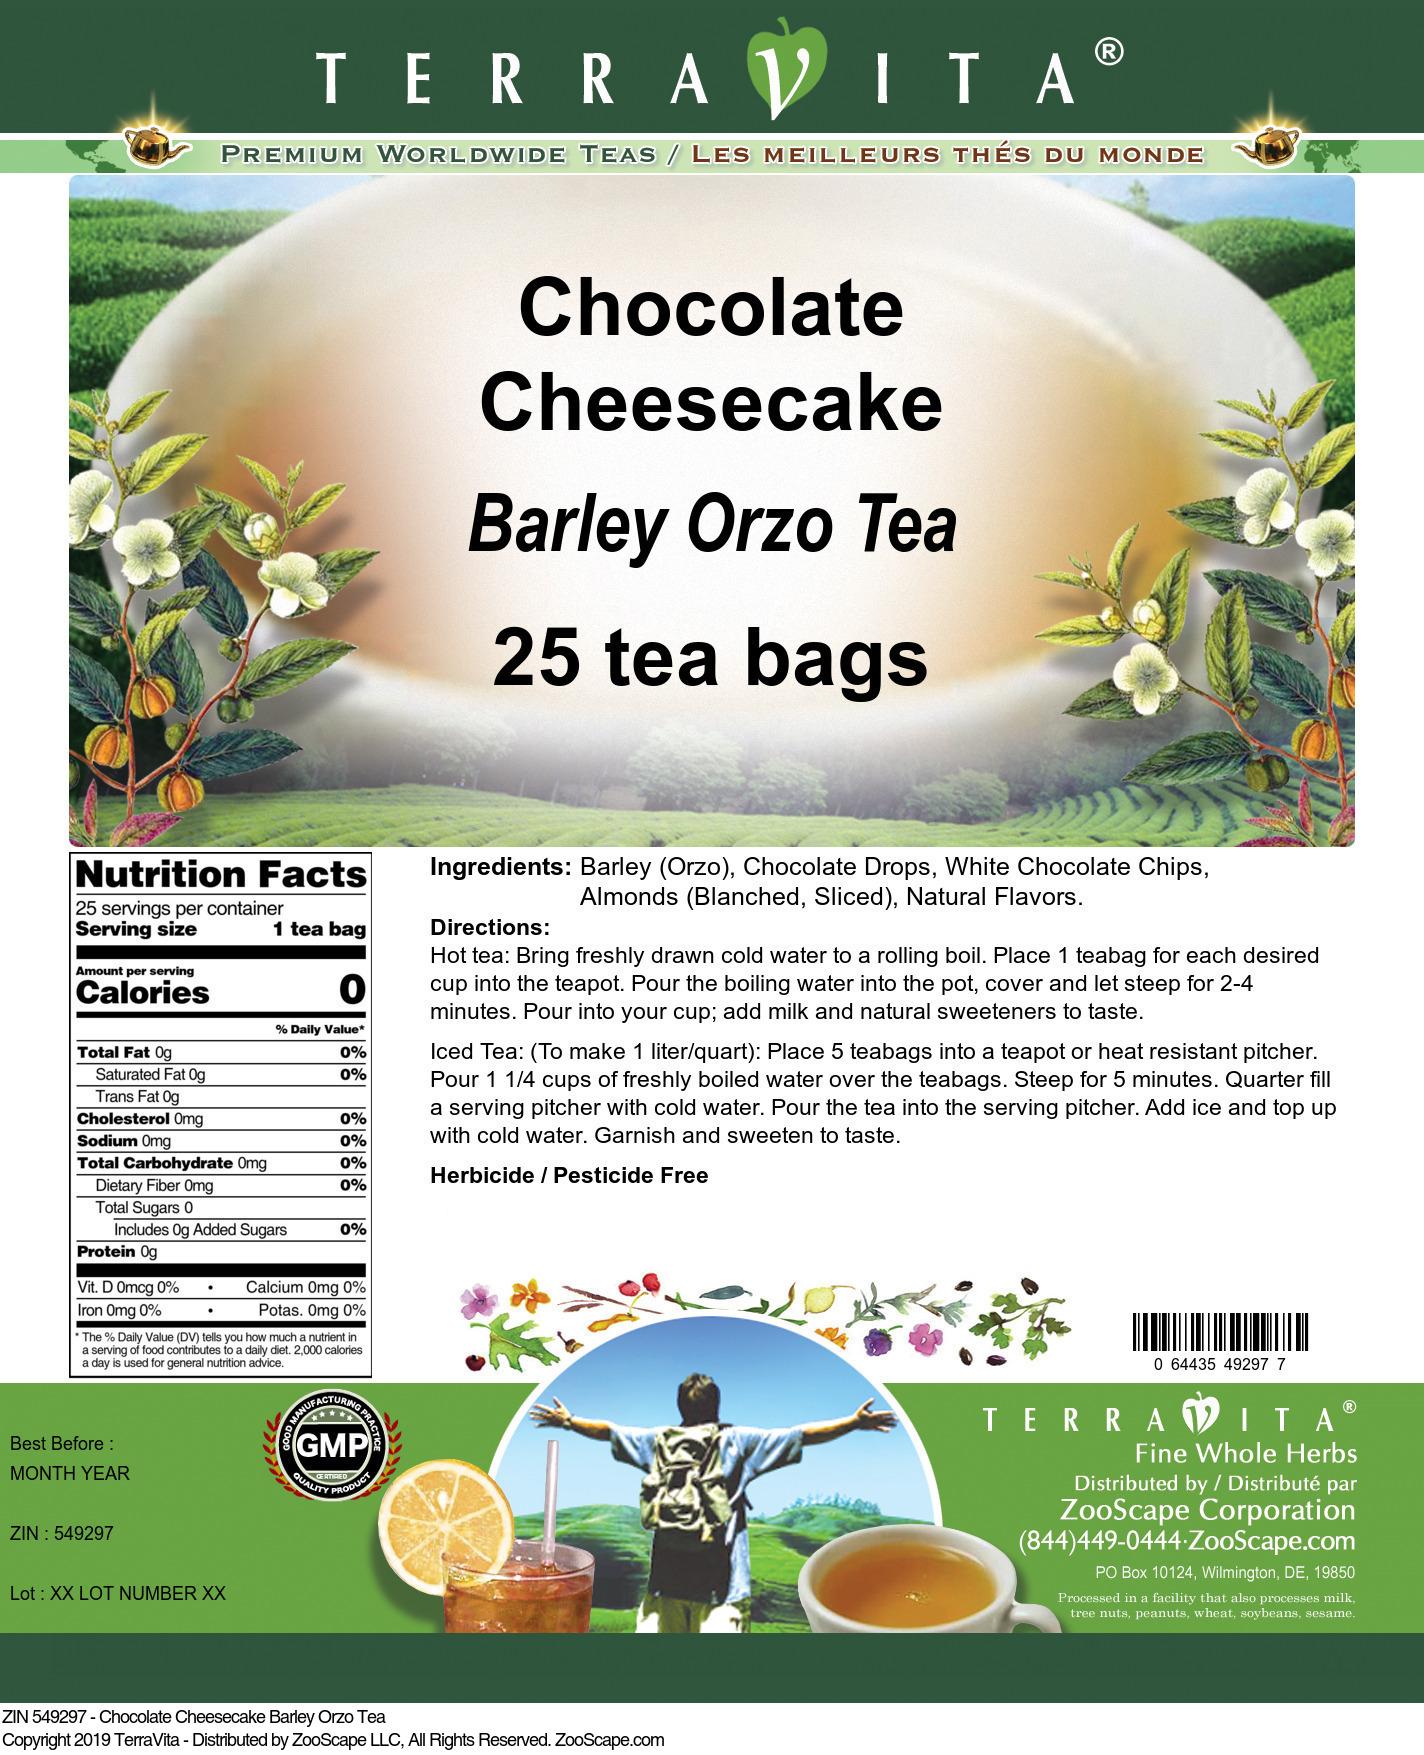 Chocolate Cheesecake Barley Orzo